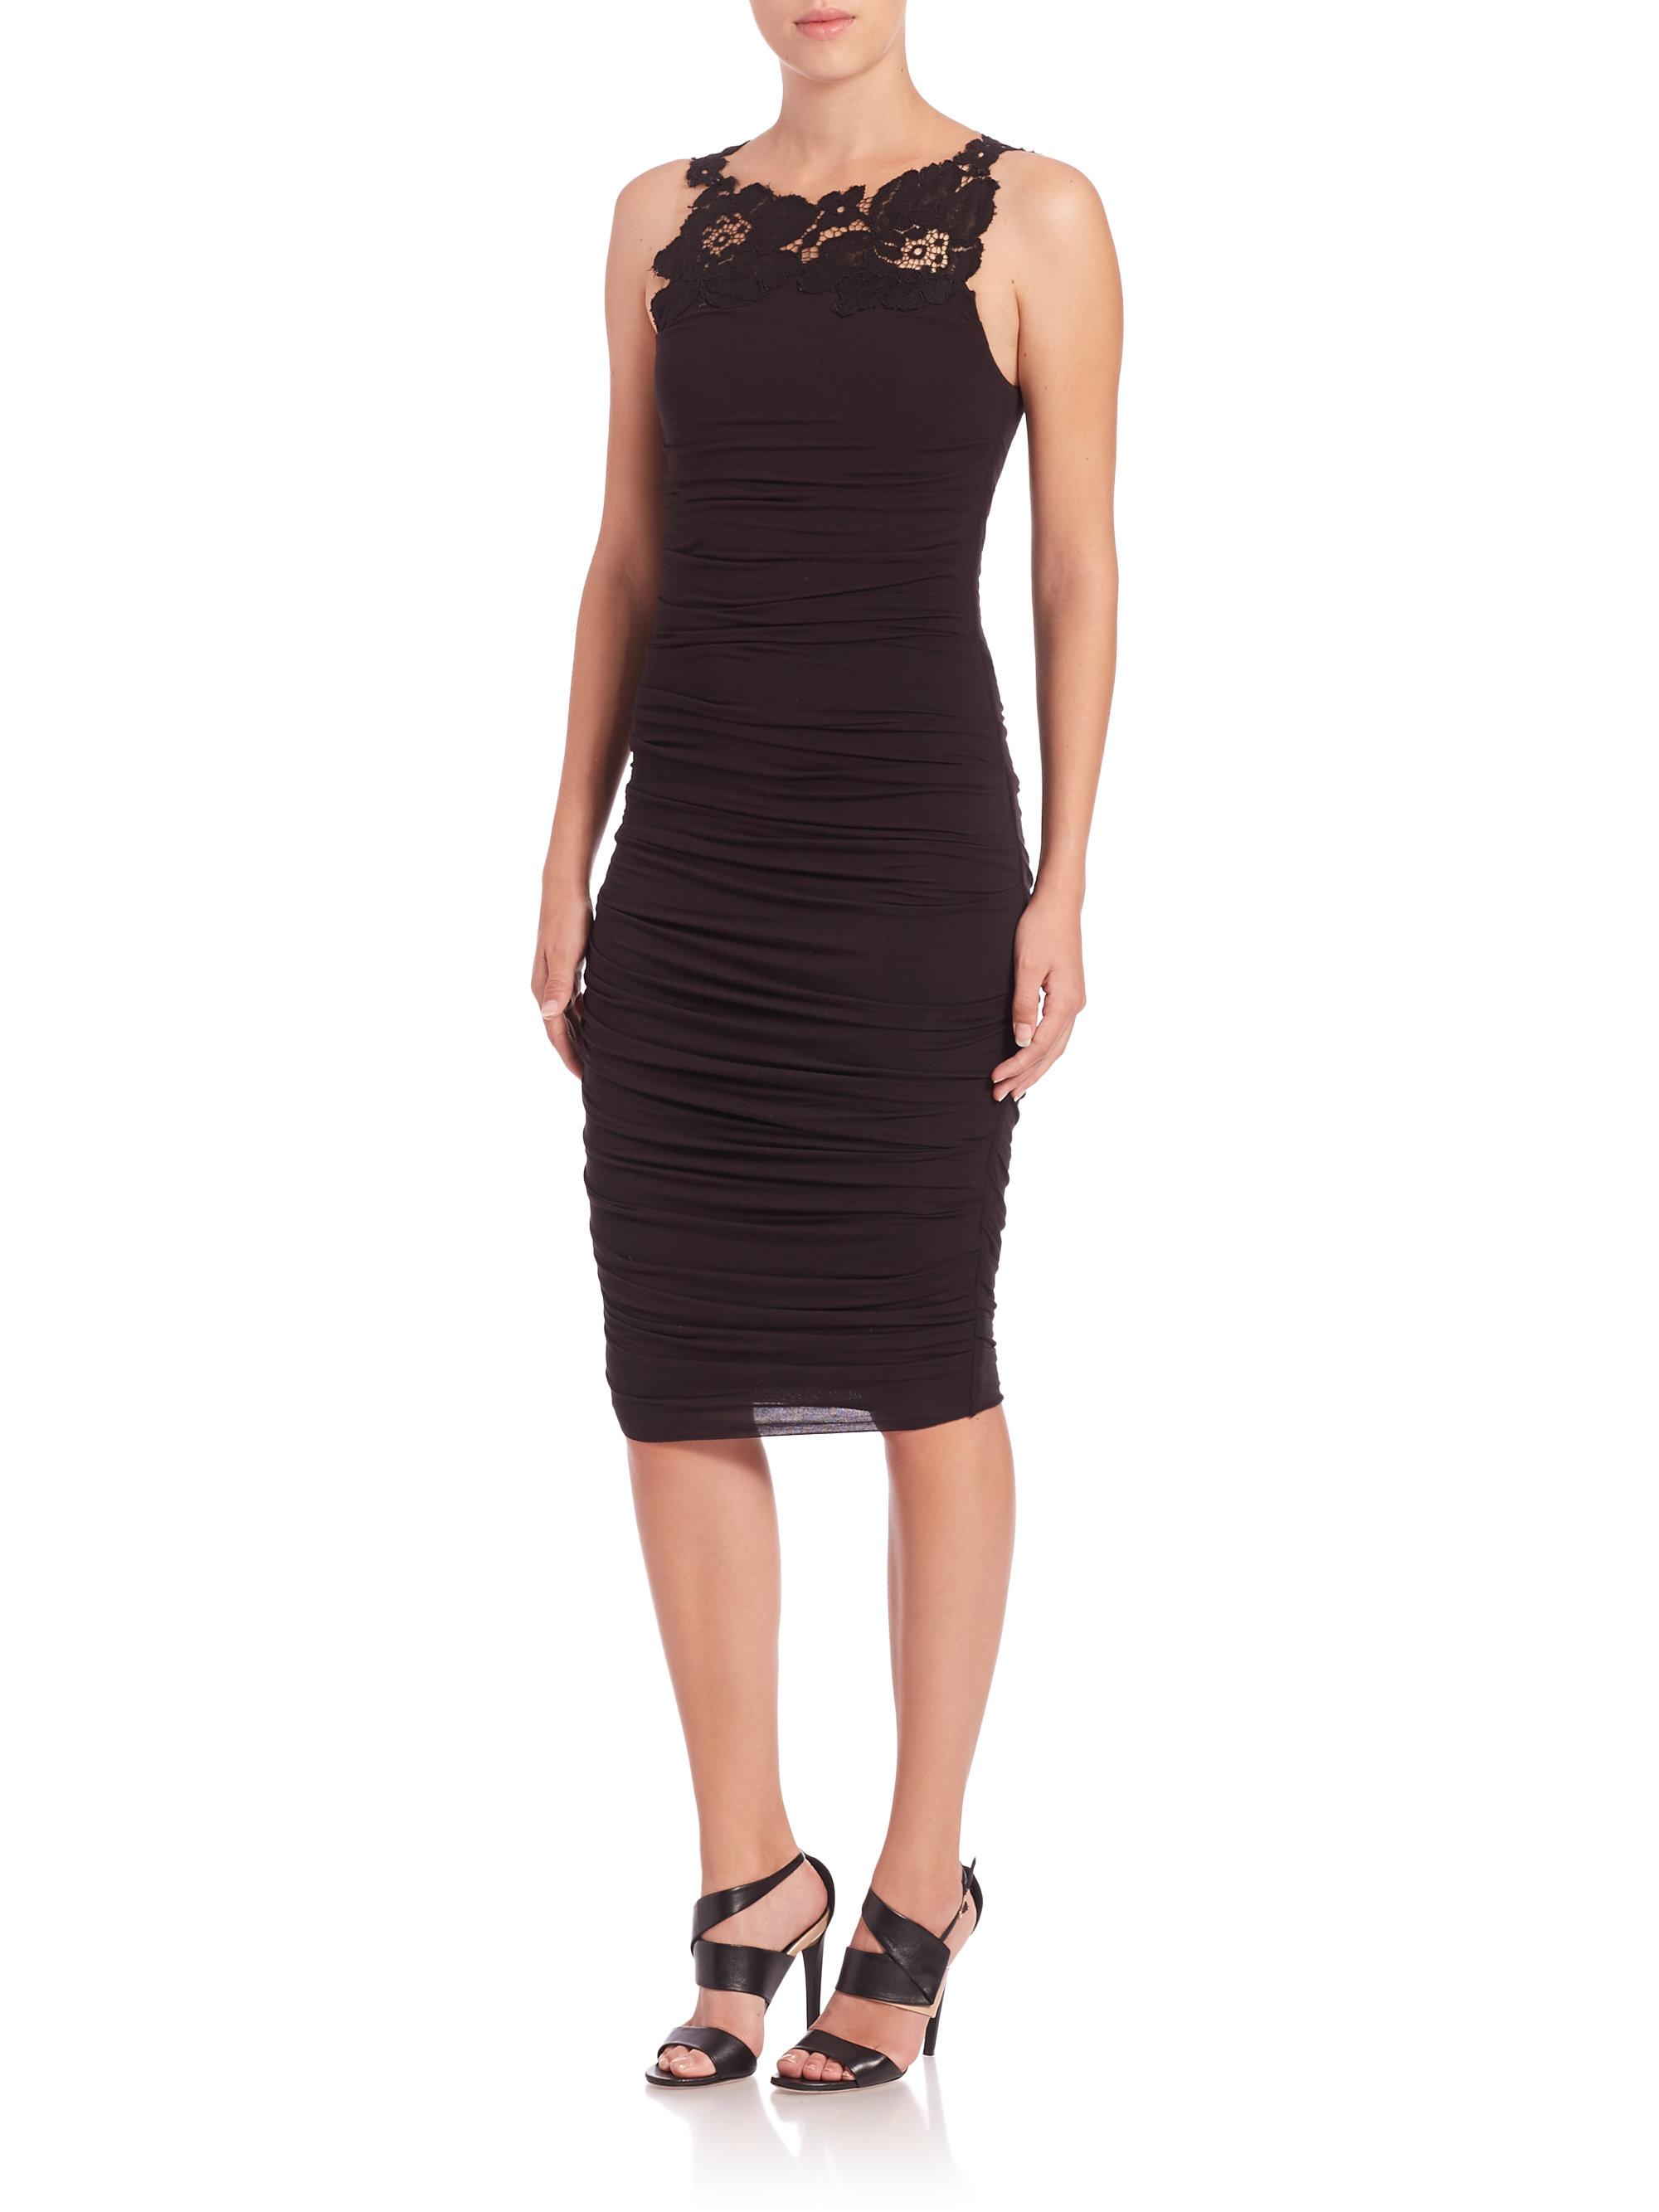 Crawford Ruched Lace Trim Dress